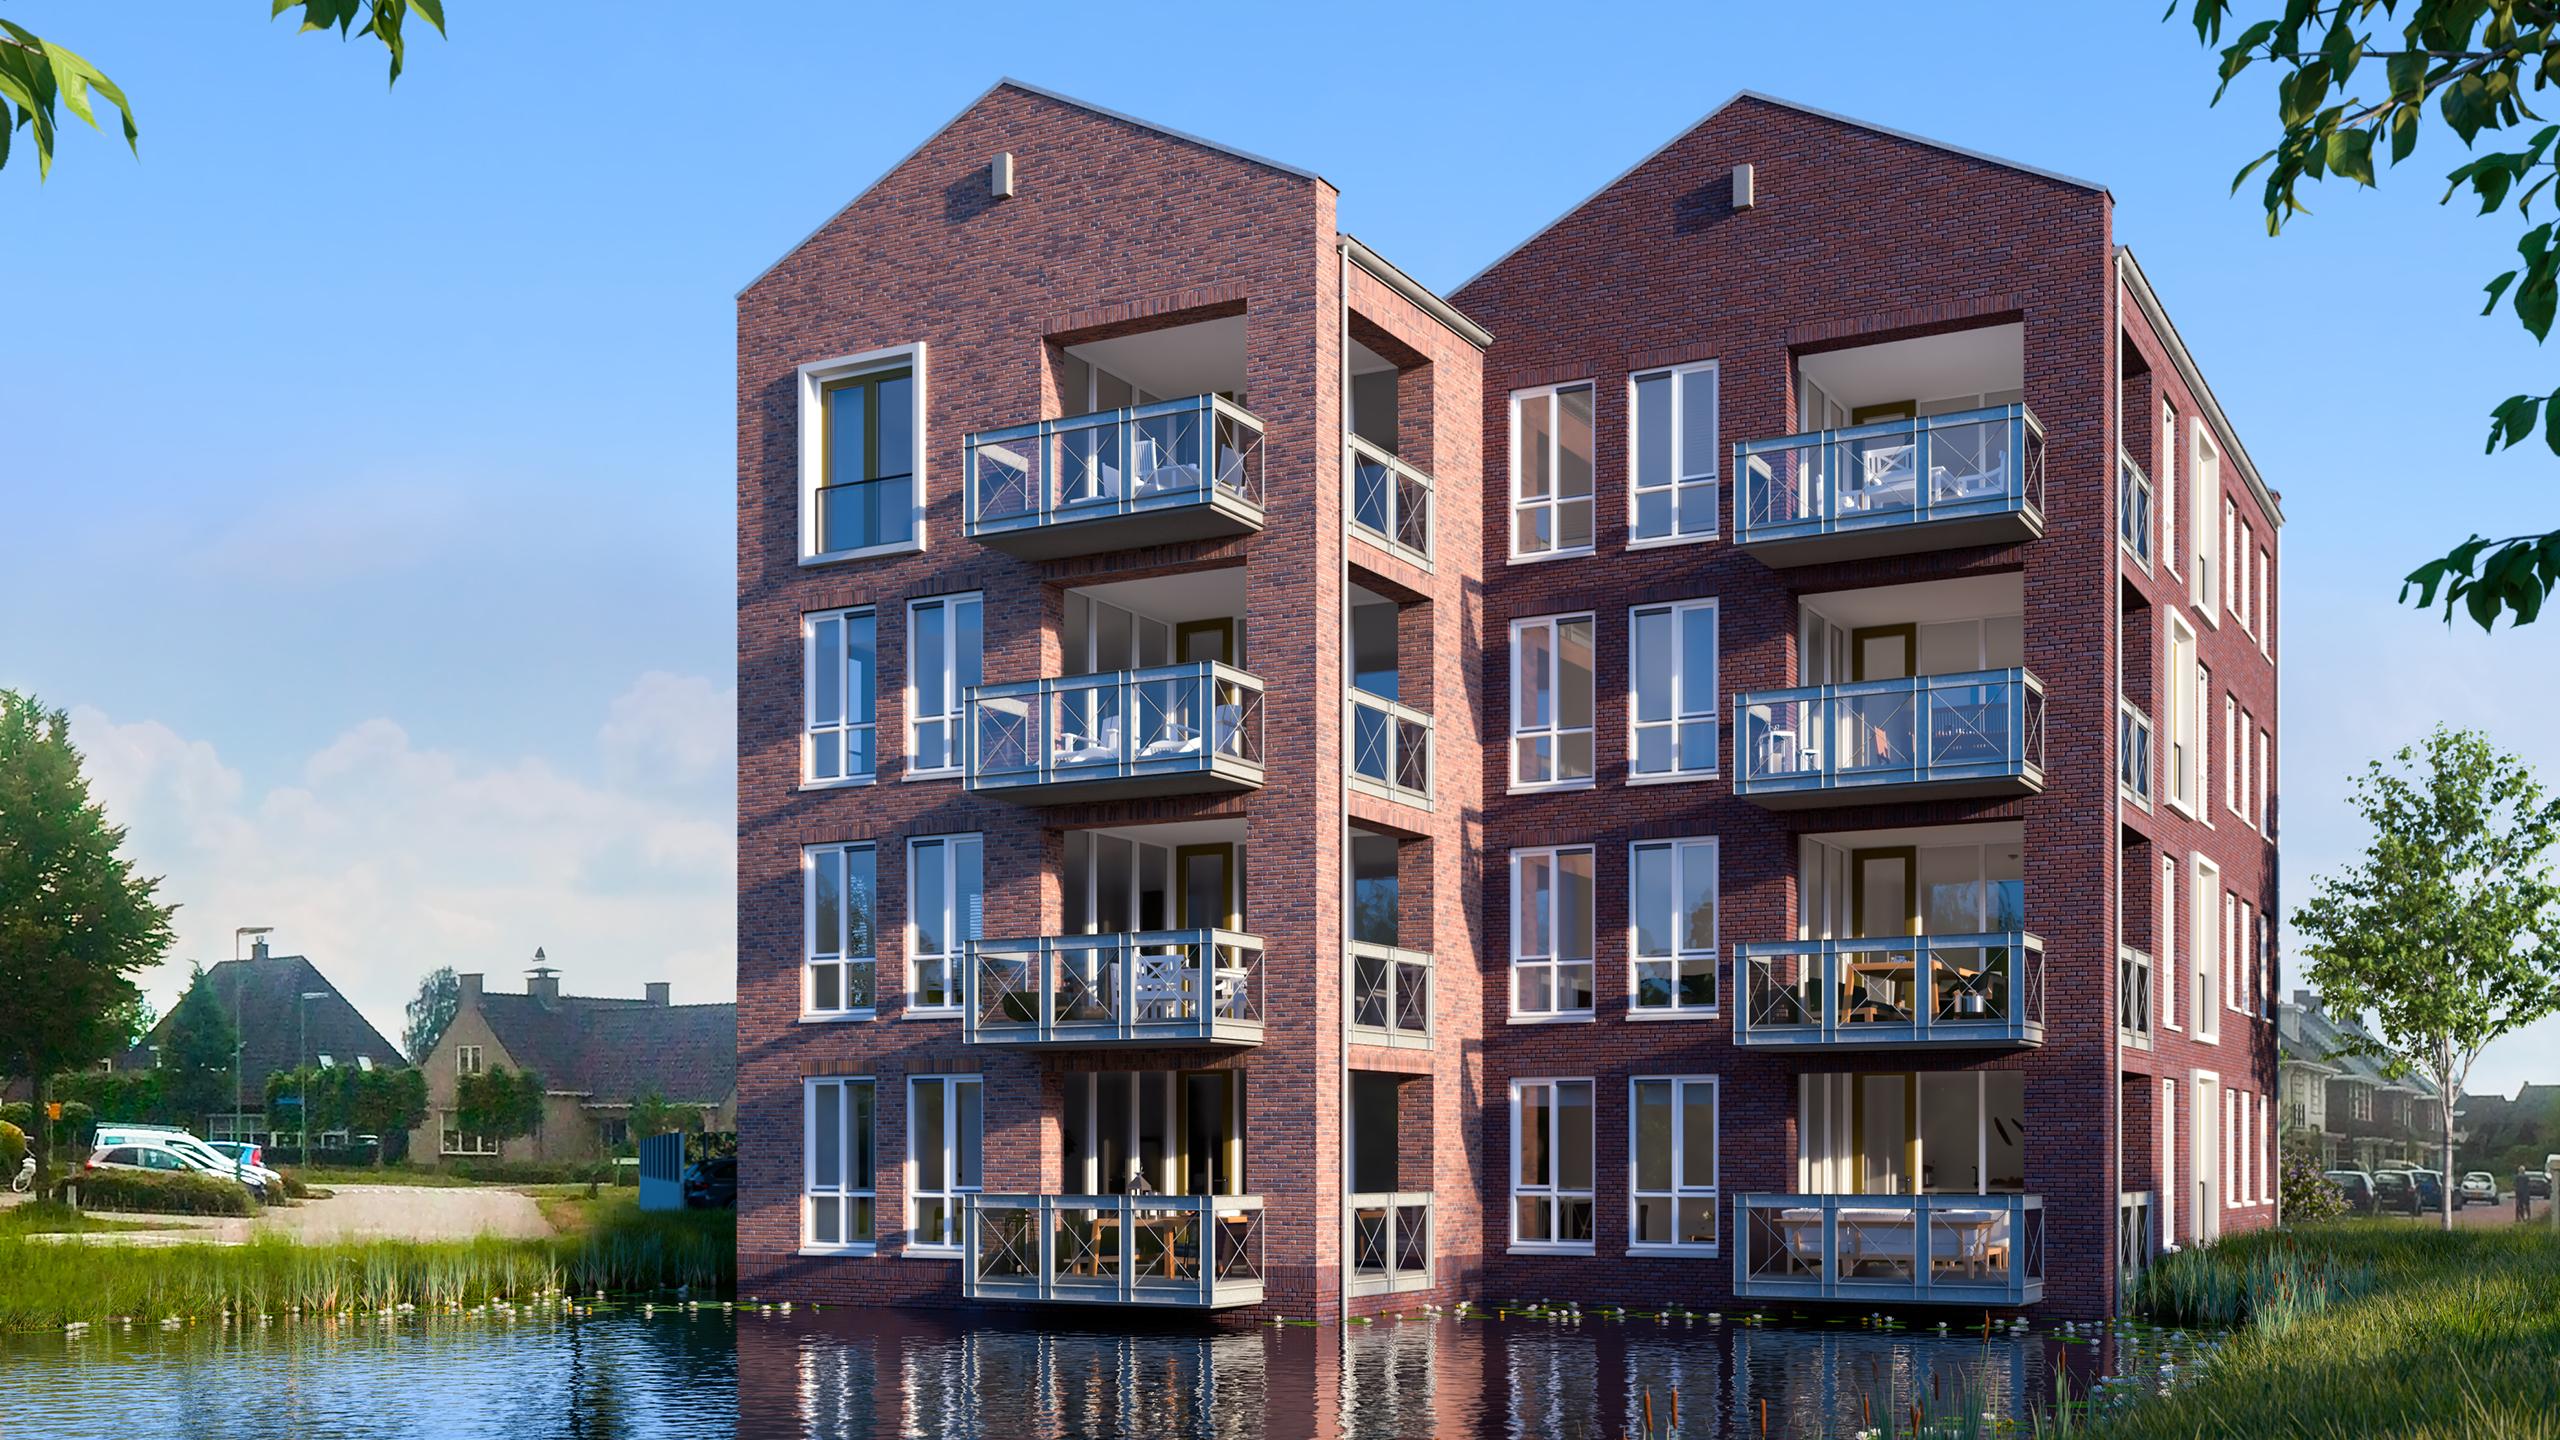 Westerhei, appartementen, Weusten Liedenbaum Architecten